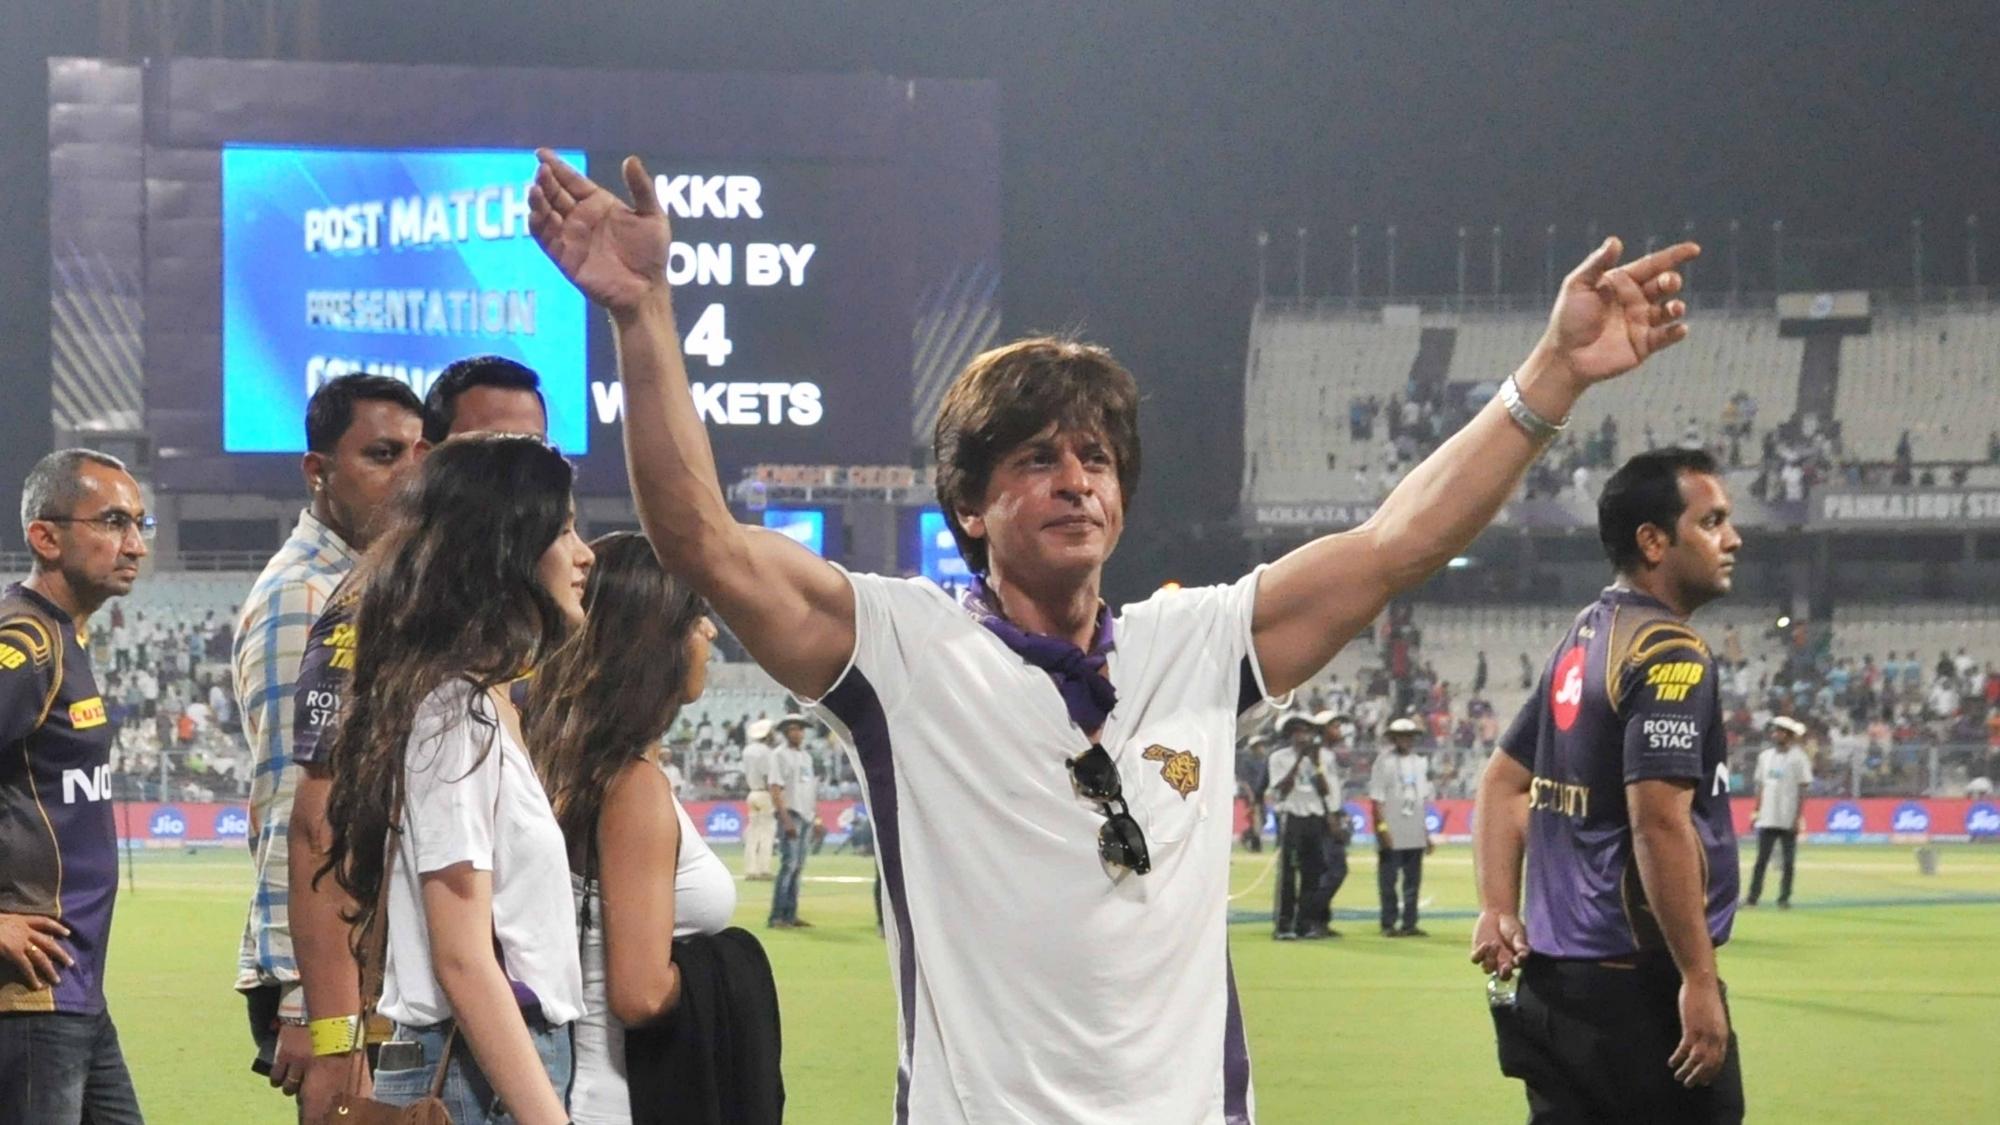 IPL 2018: Eden bow down to SRK amidst Kohli, ABD presence